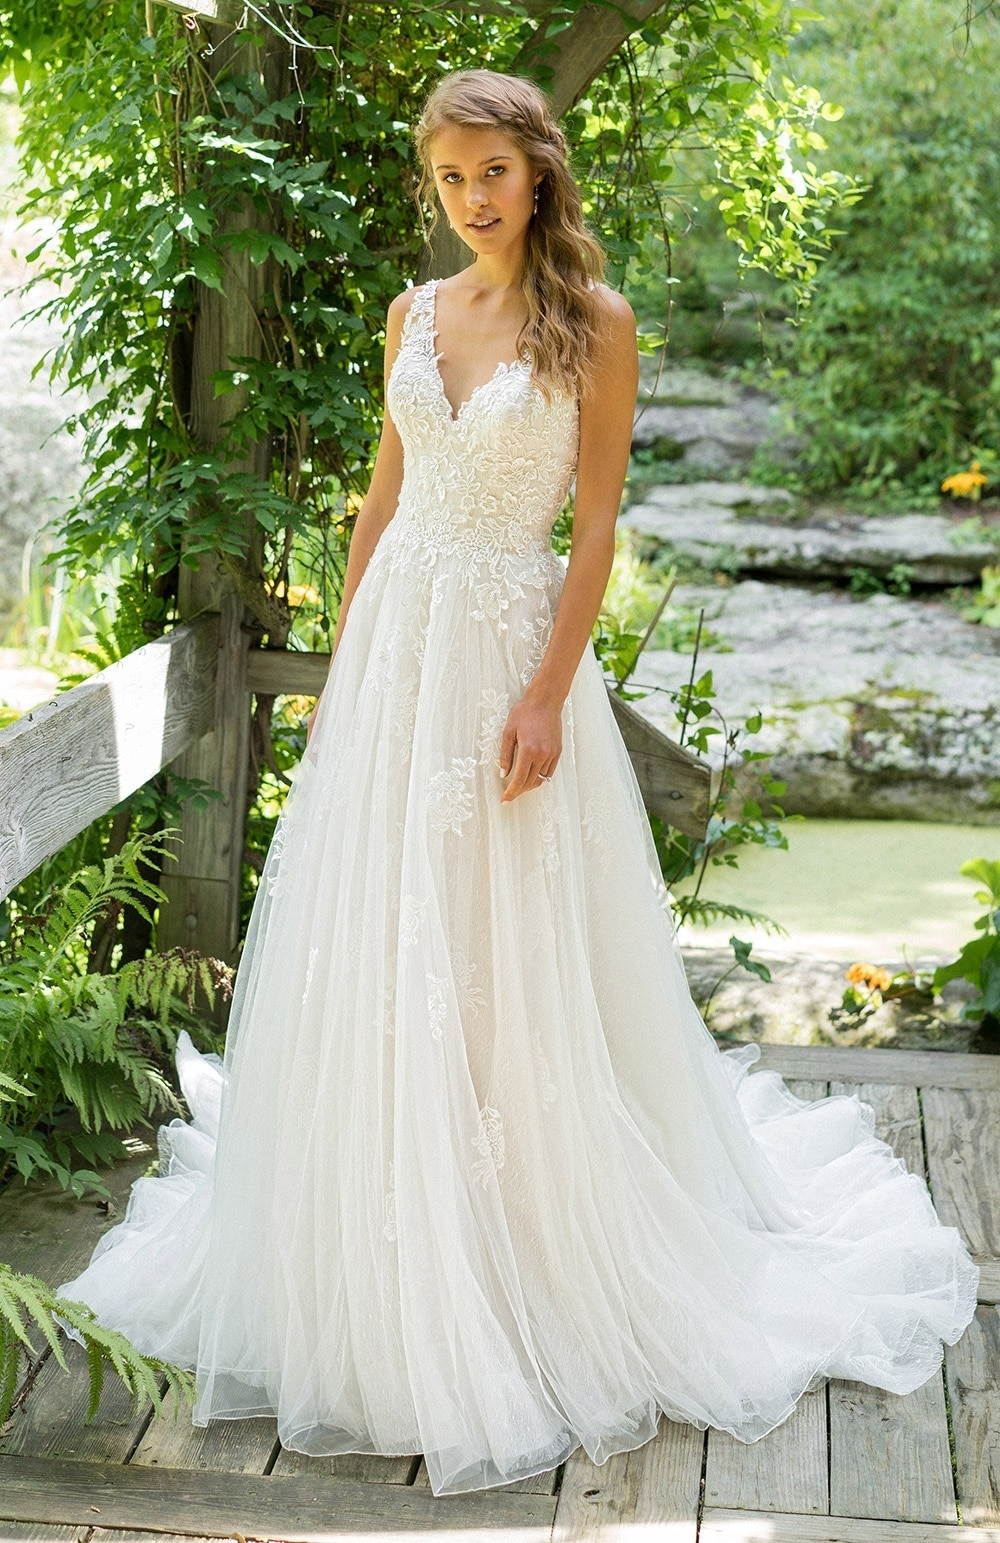 Robe de mariée Modèle Naomi